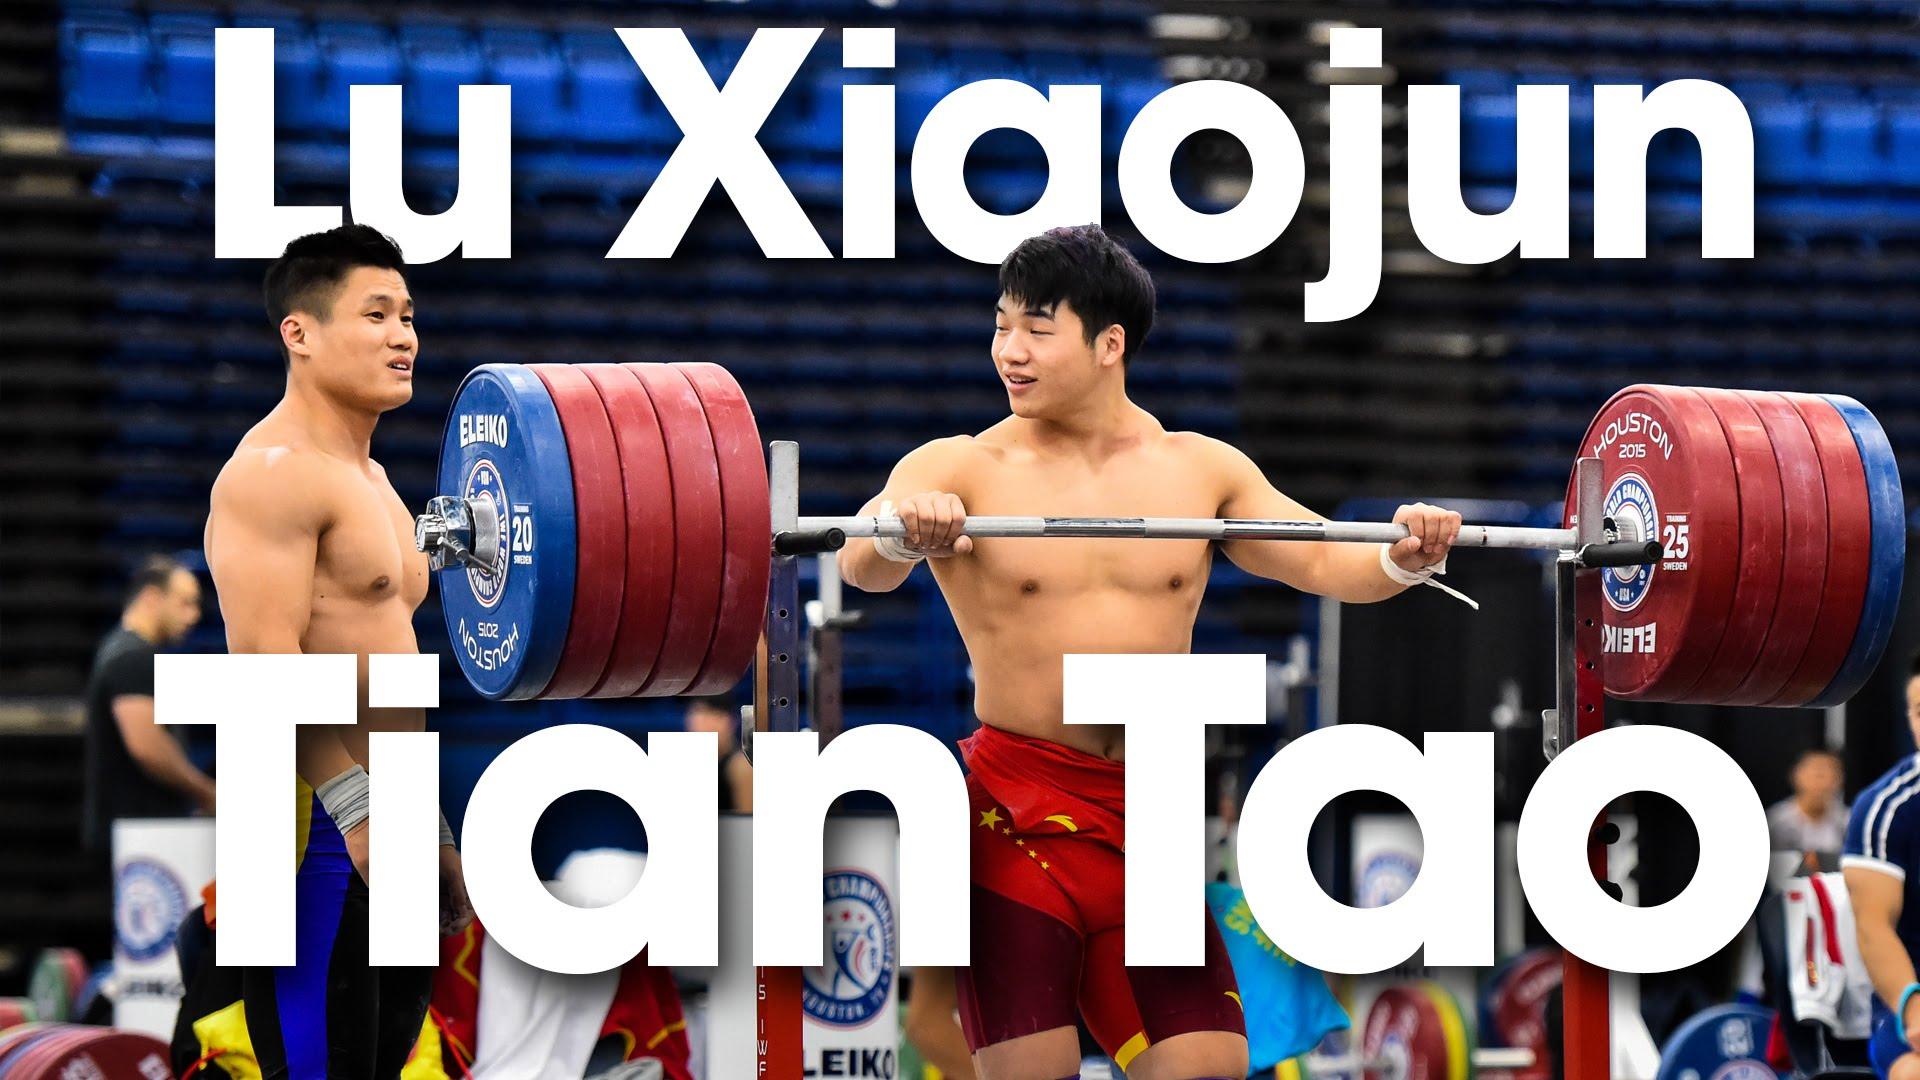 Lu Xiaojun Amp Tian Tao 295kg Front Rack Holds 2015 Worlds